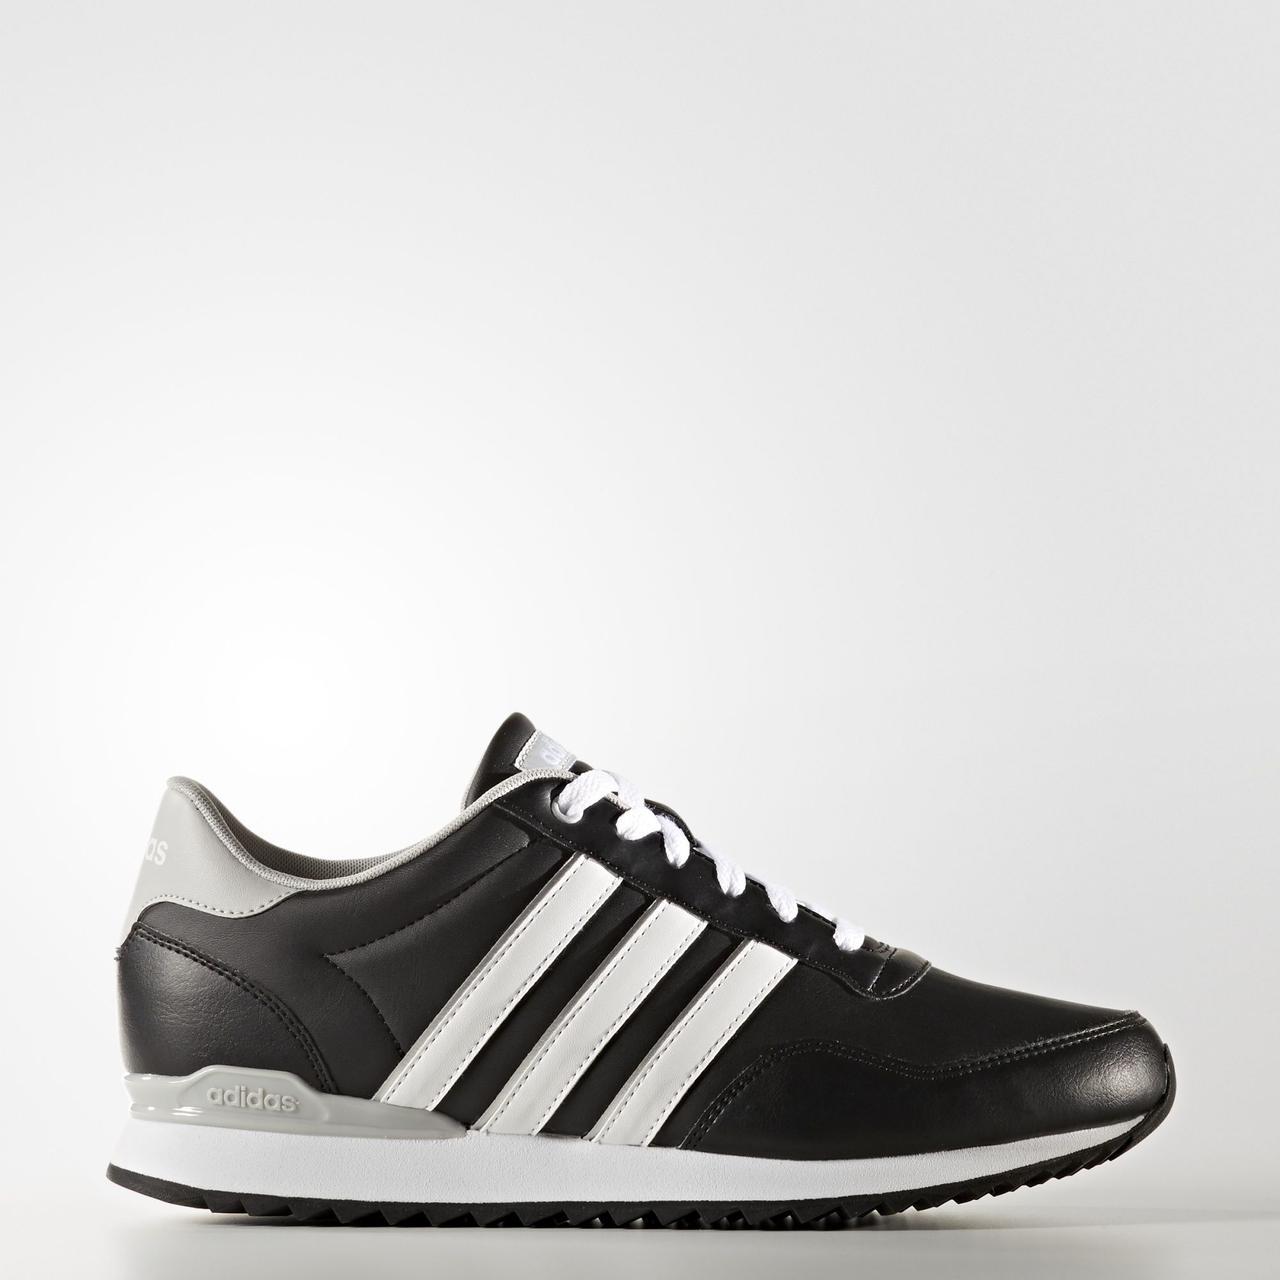 edc8a28d Мужские кроссовки Adidas Neo Jogger CL (Артикул: BB9682) - Интернет-магазин  «